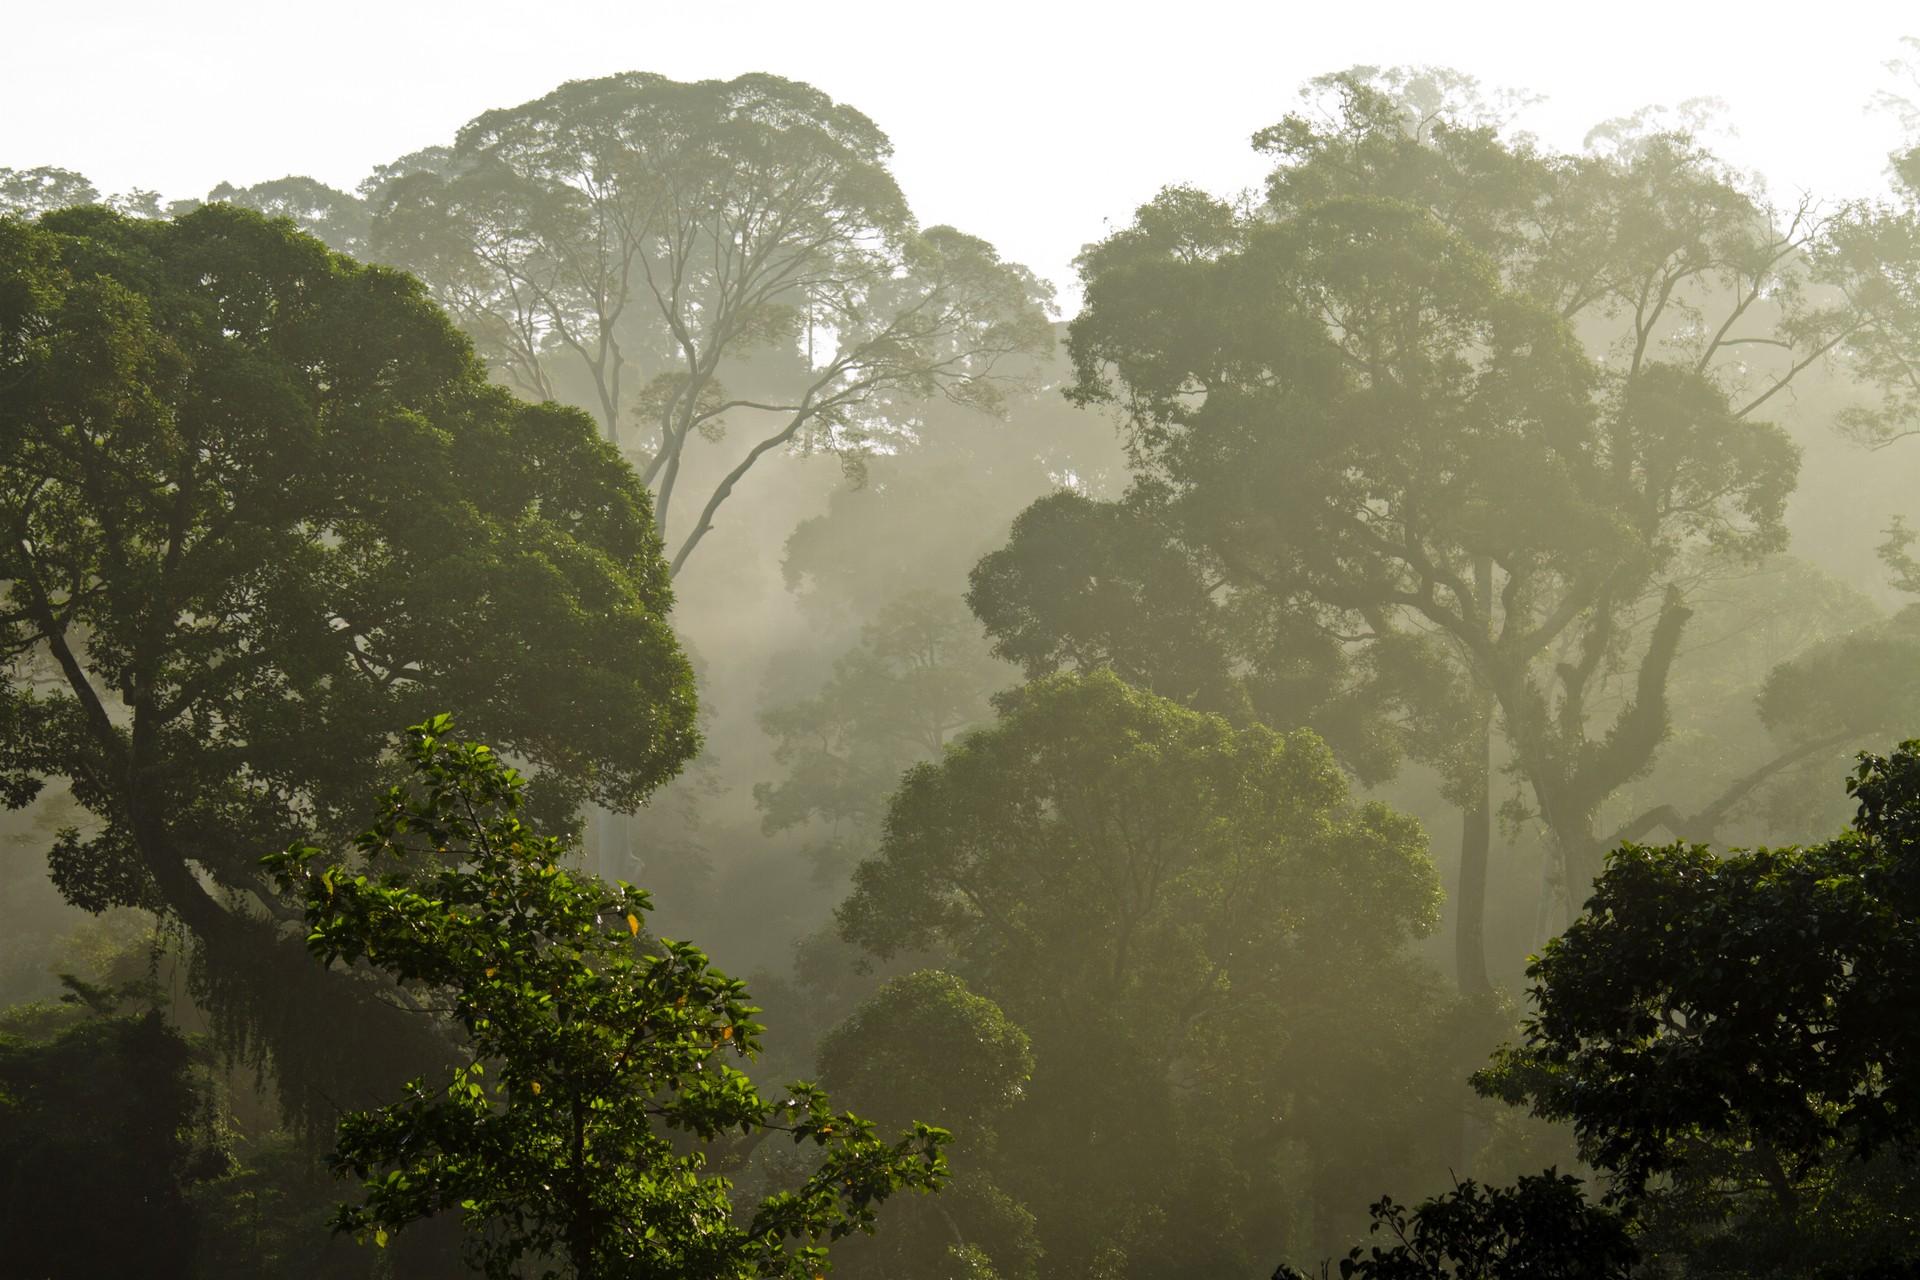 The rainforest canopy of the Danum Valley, Borneo